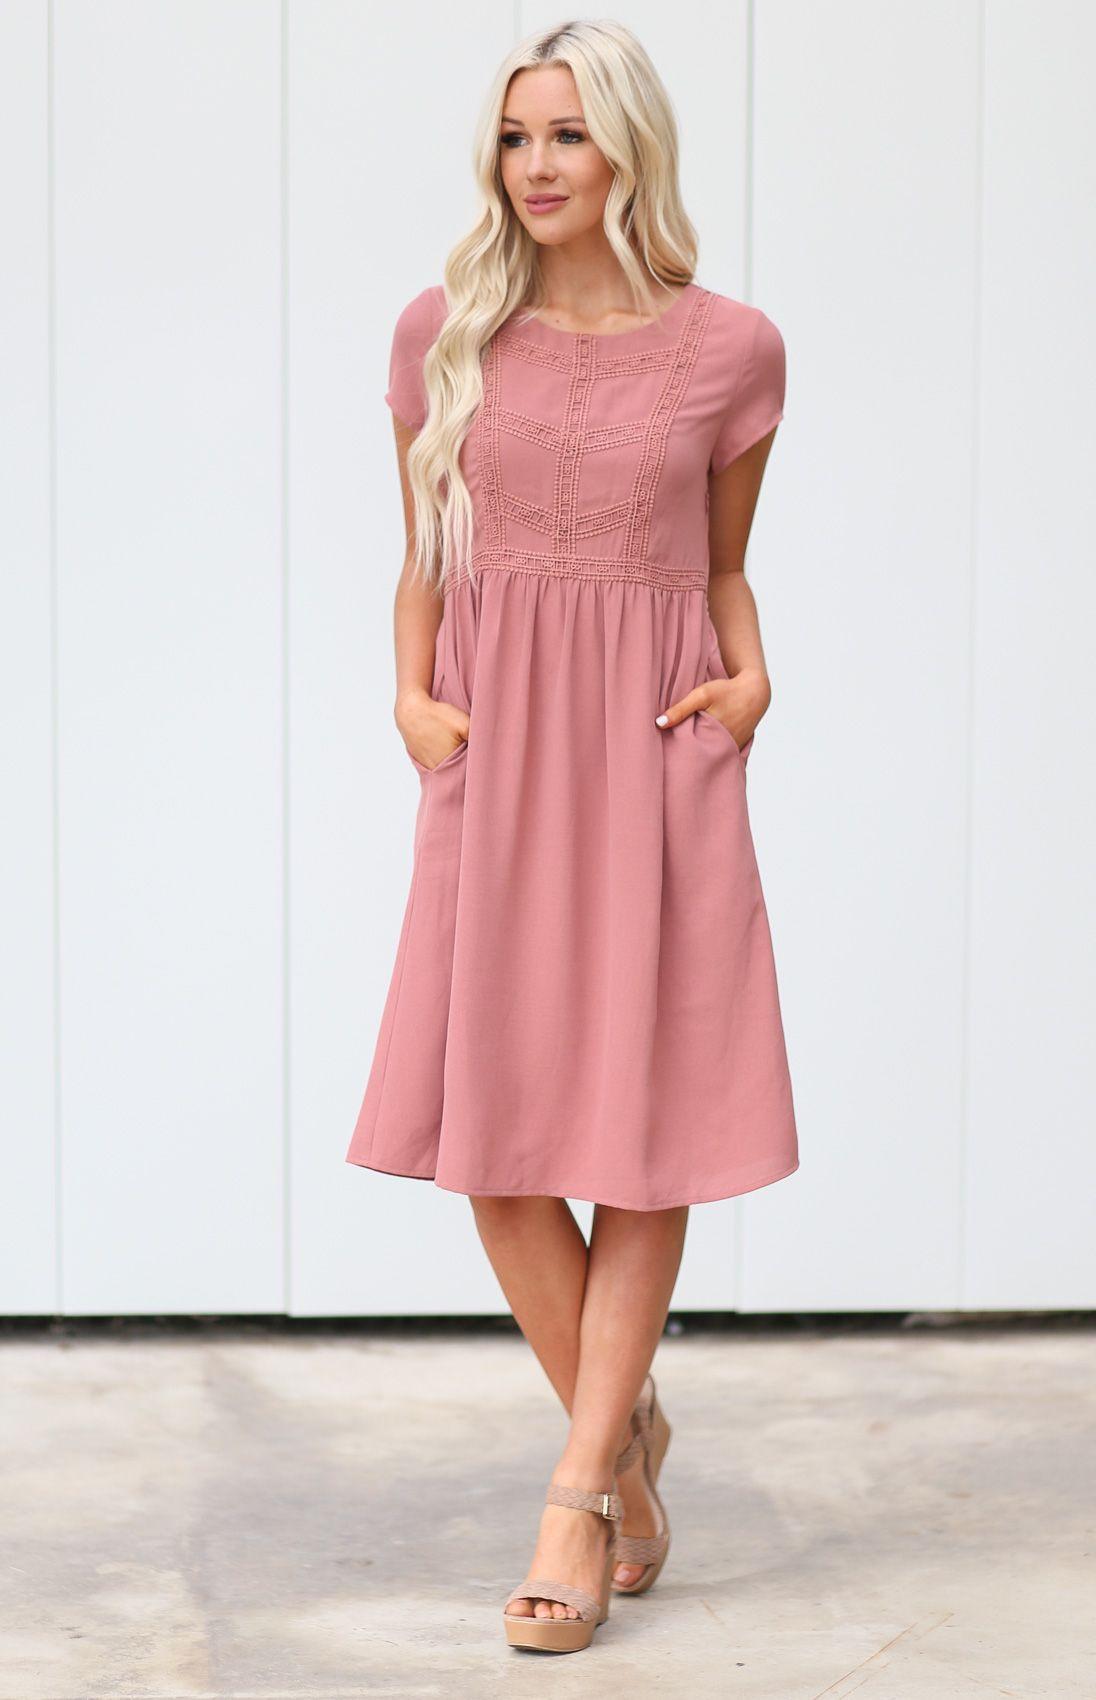 POCKETS! Kate Modest Easter Dress